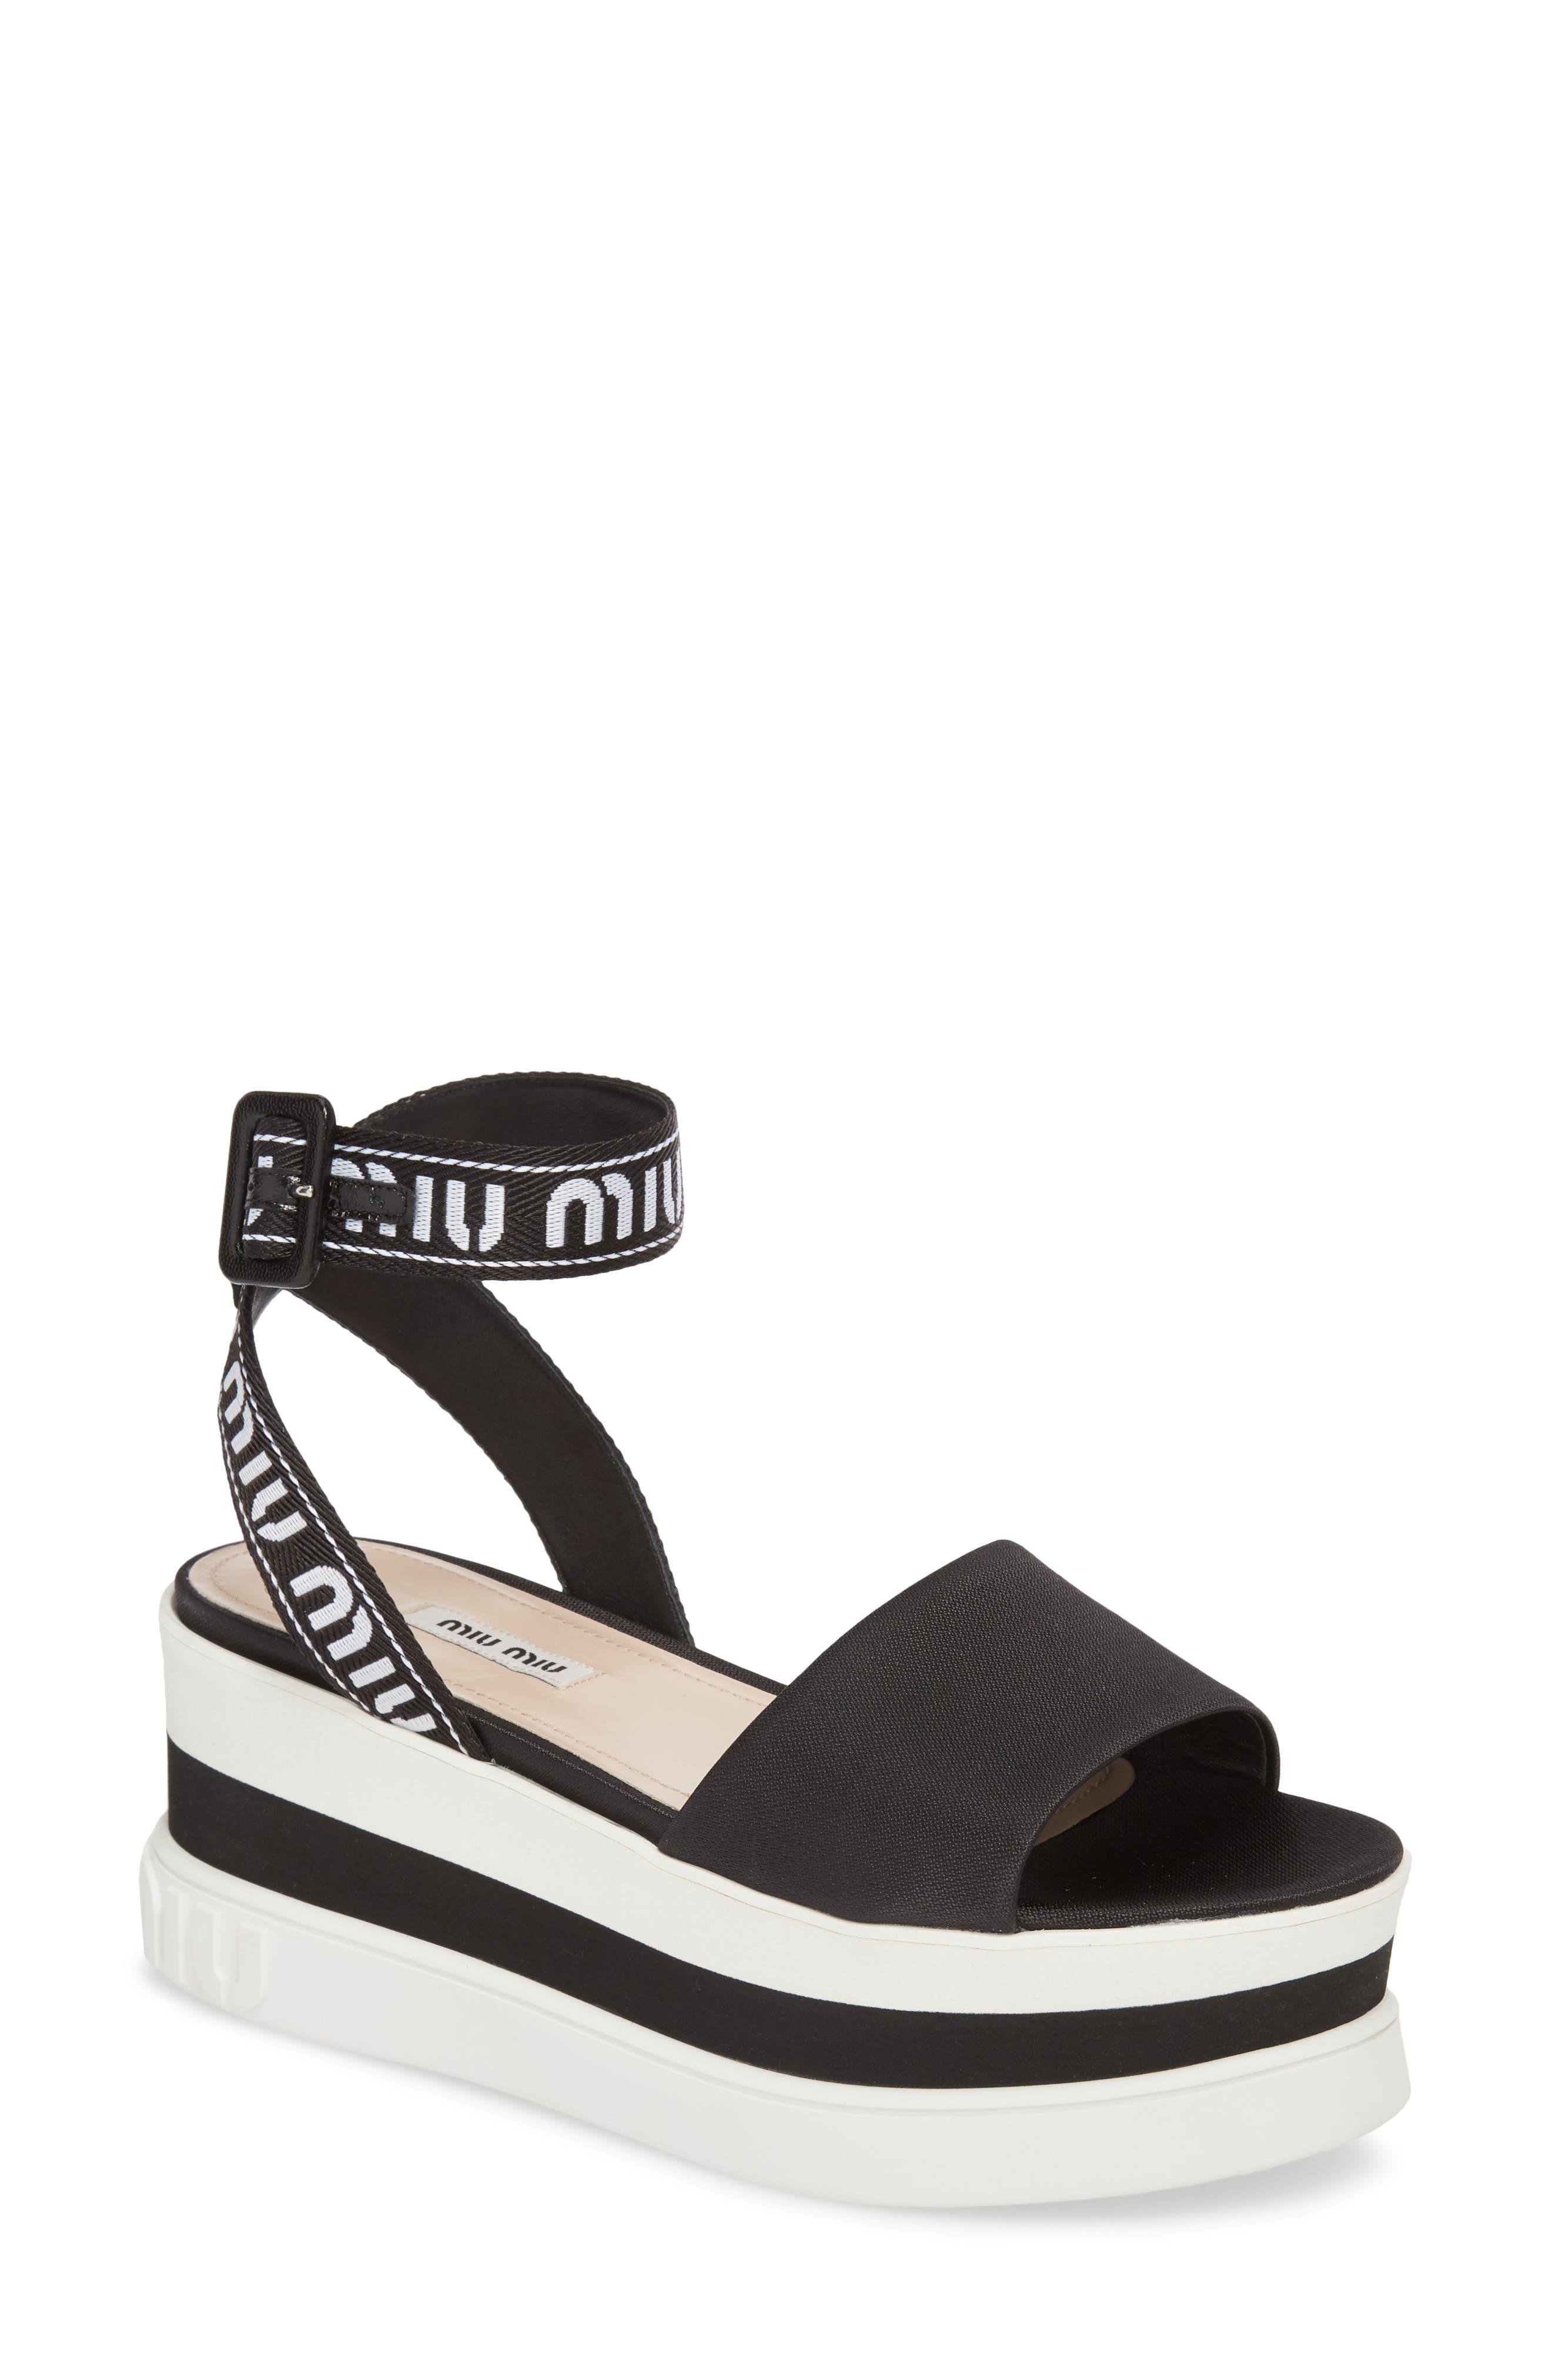 MIU MIU Flatform Logo Sandal, Main, color, BLACK